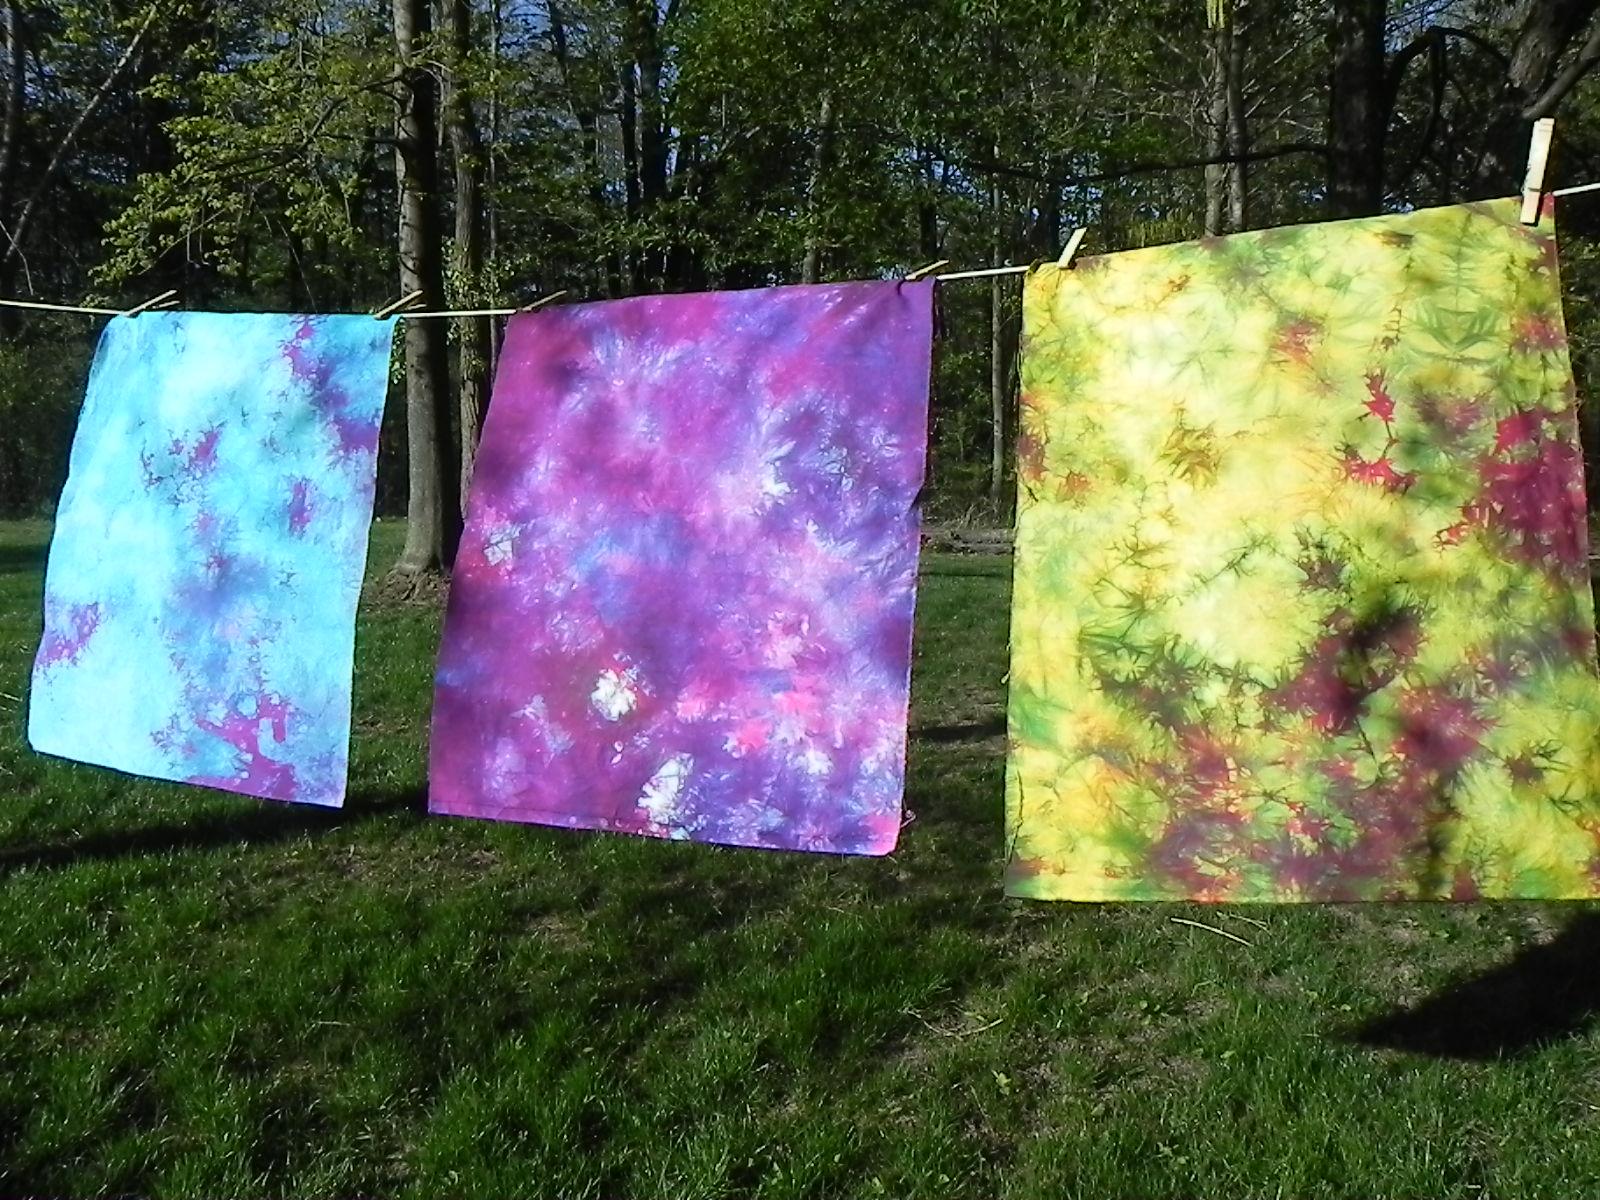 Color Parfait #1: Fabric #1 (on bottom): Turquoise. Fabric #2 (middle): Fushia. Fabric #3 (on top): Sunny Yellow